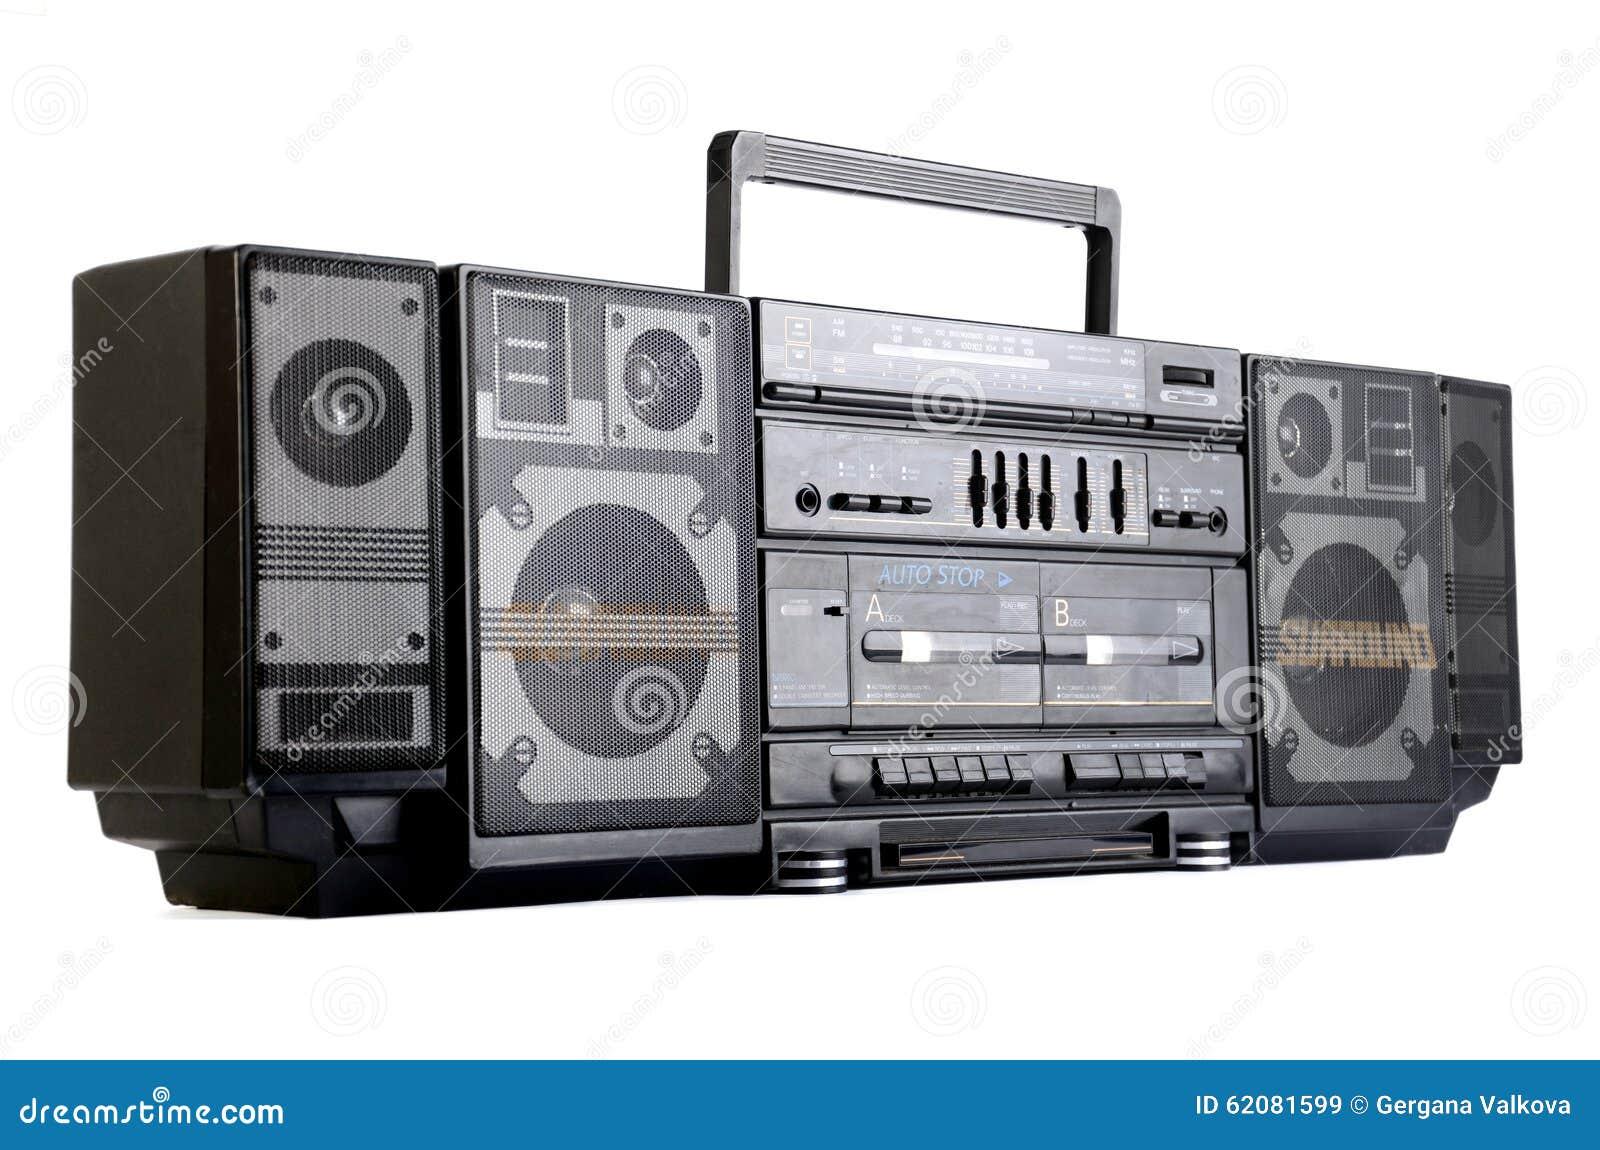 hip hop surround sound radio isolated on white stock image image 62081599. Black Bedroom Furniture Sets. Home Design Ideas